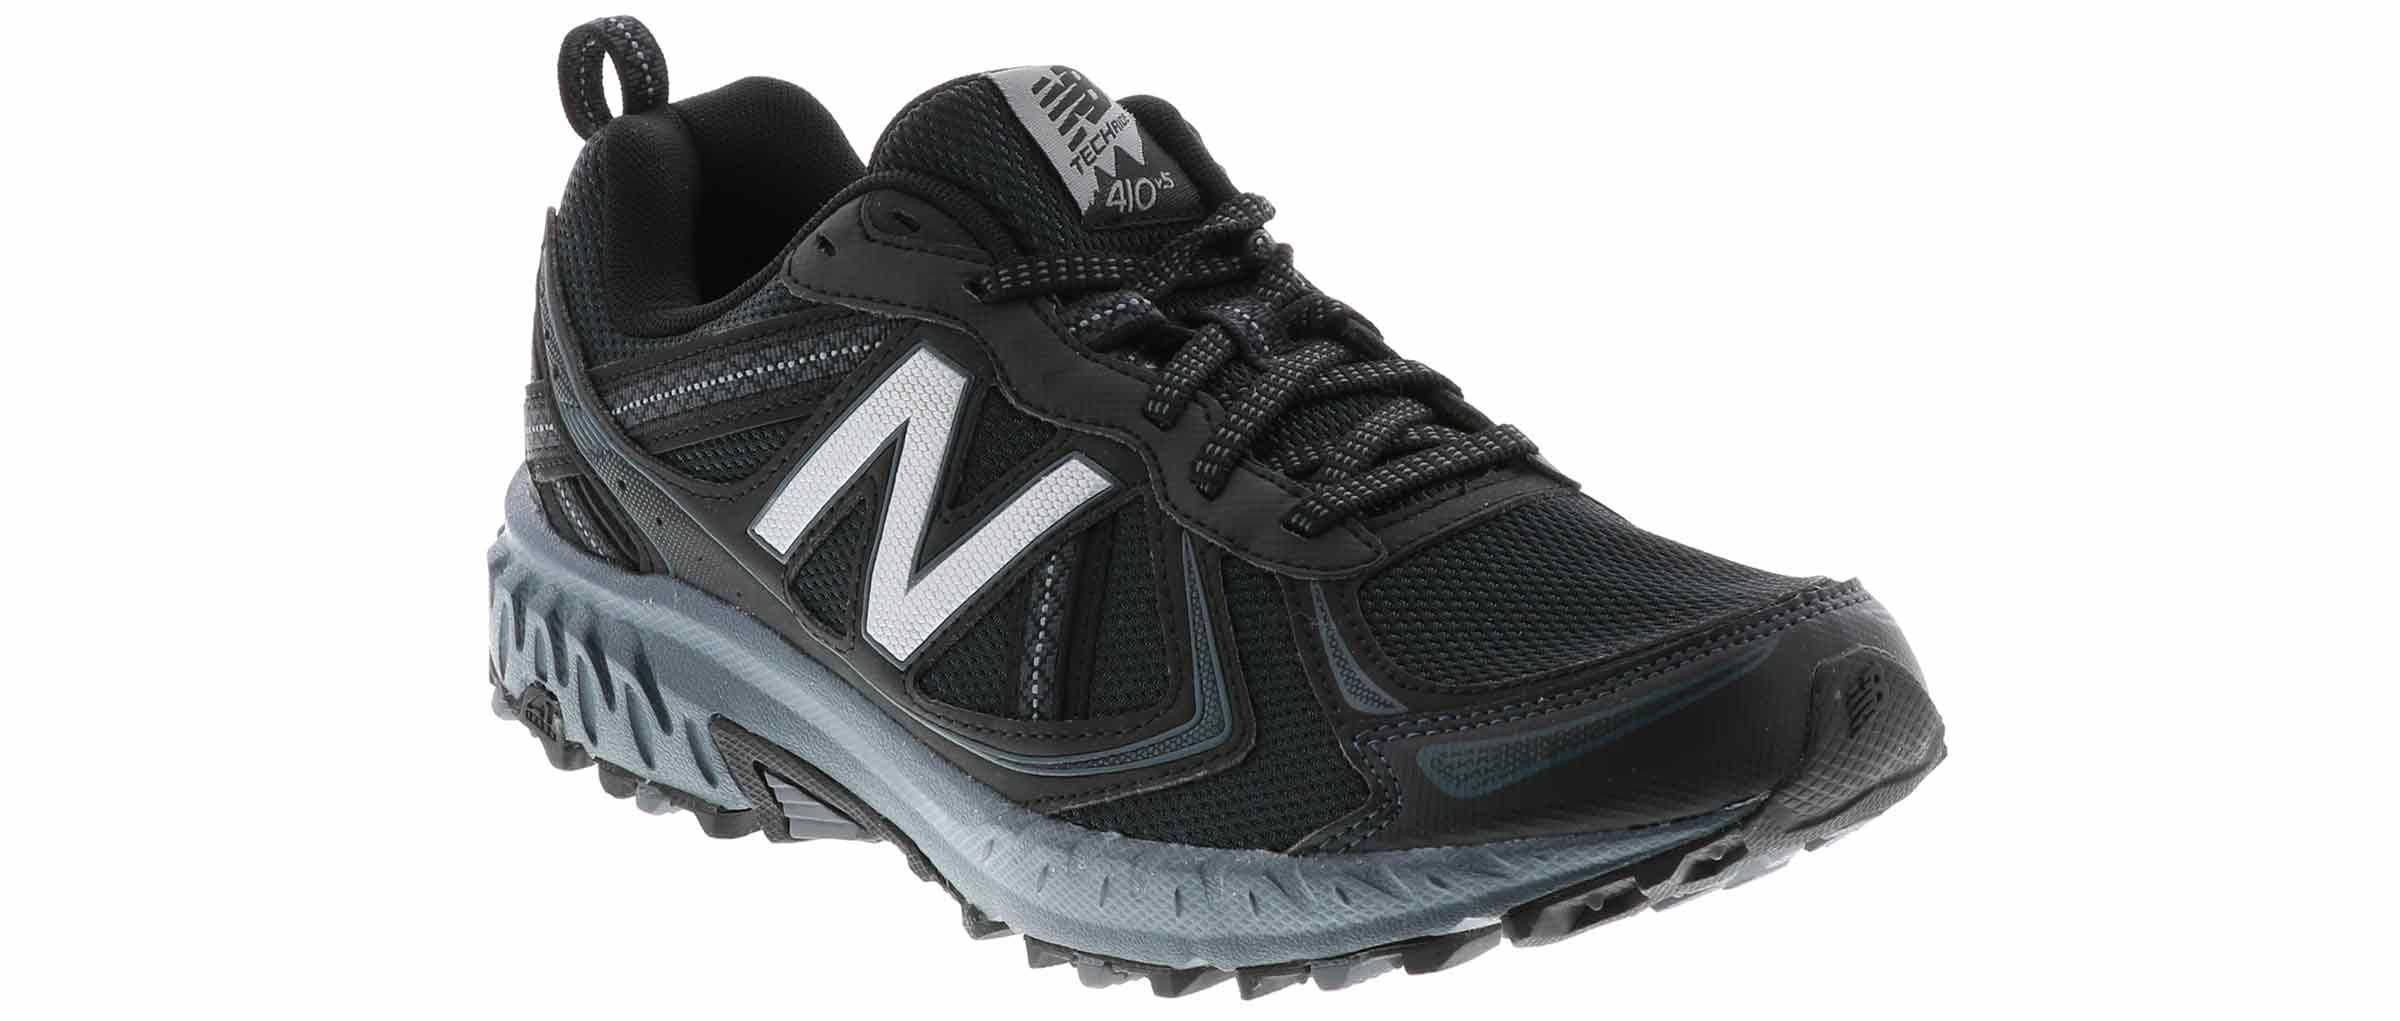 Negro Up Hombre Zapatos Mt410lb5 Lace Balance Para Low Trueno Top New Caminar qvx1Y6n7gw